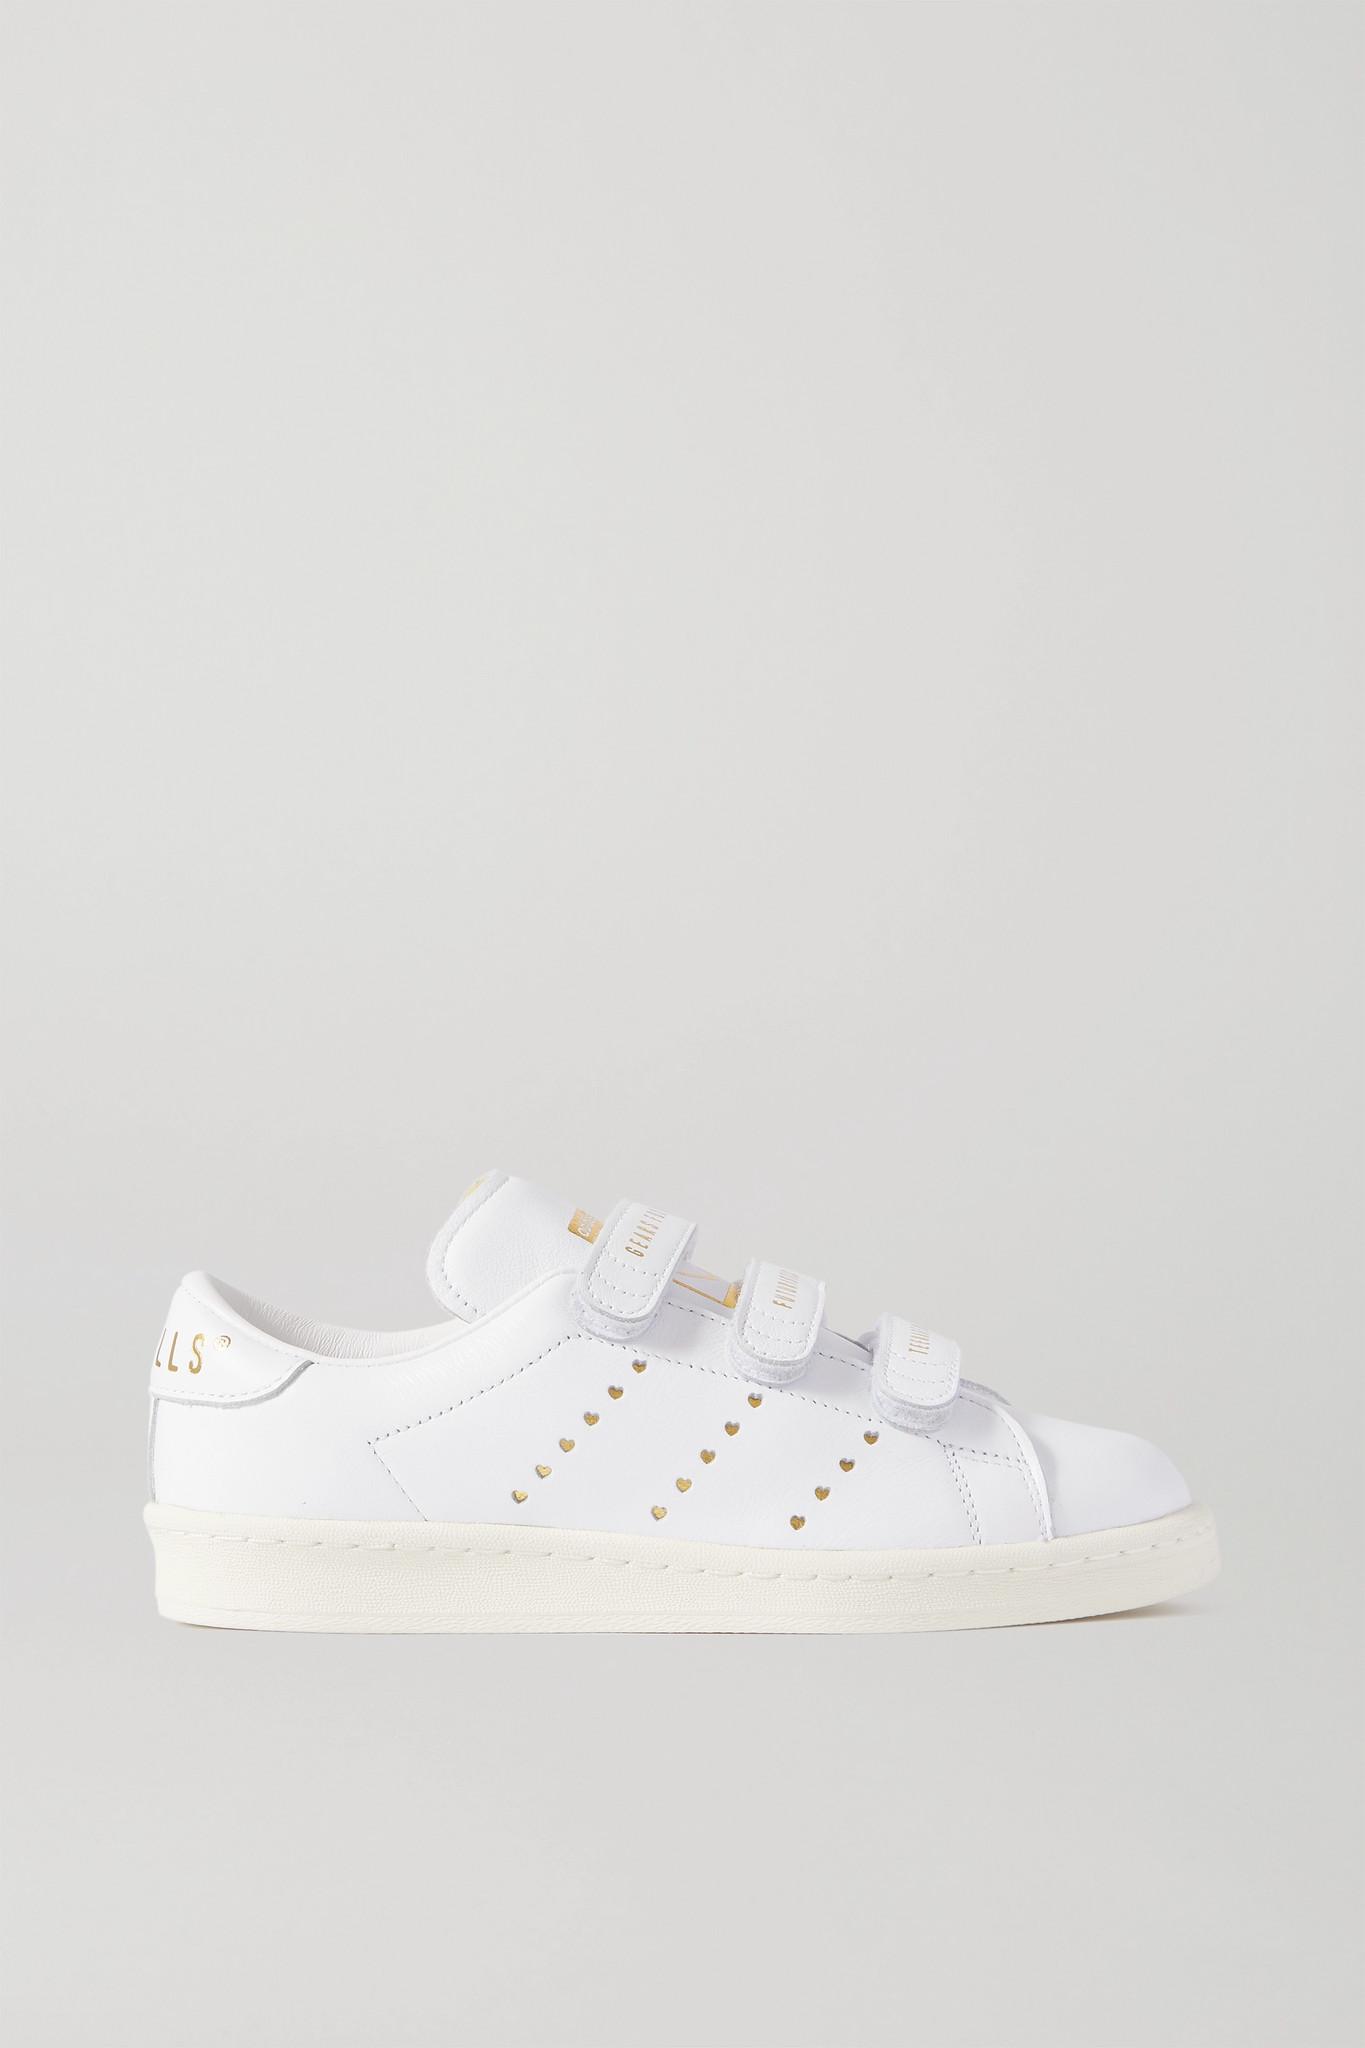 ADIDAS ORIGINALS - X Human Made 印花皮革运动鞋 - 白色 - UK3.5